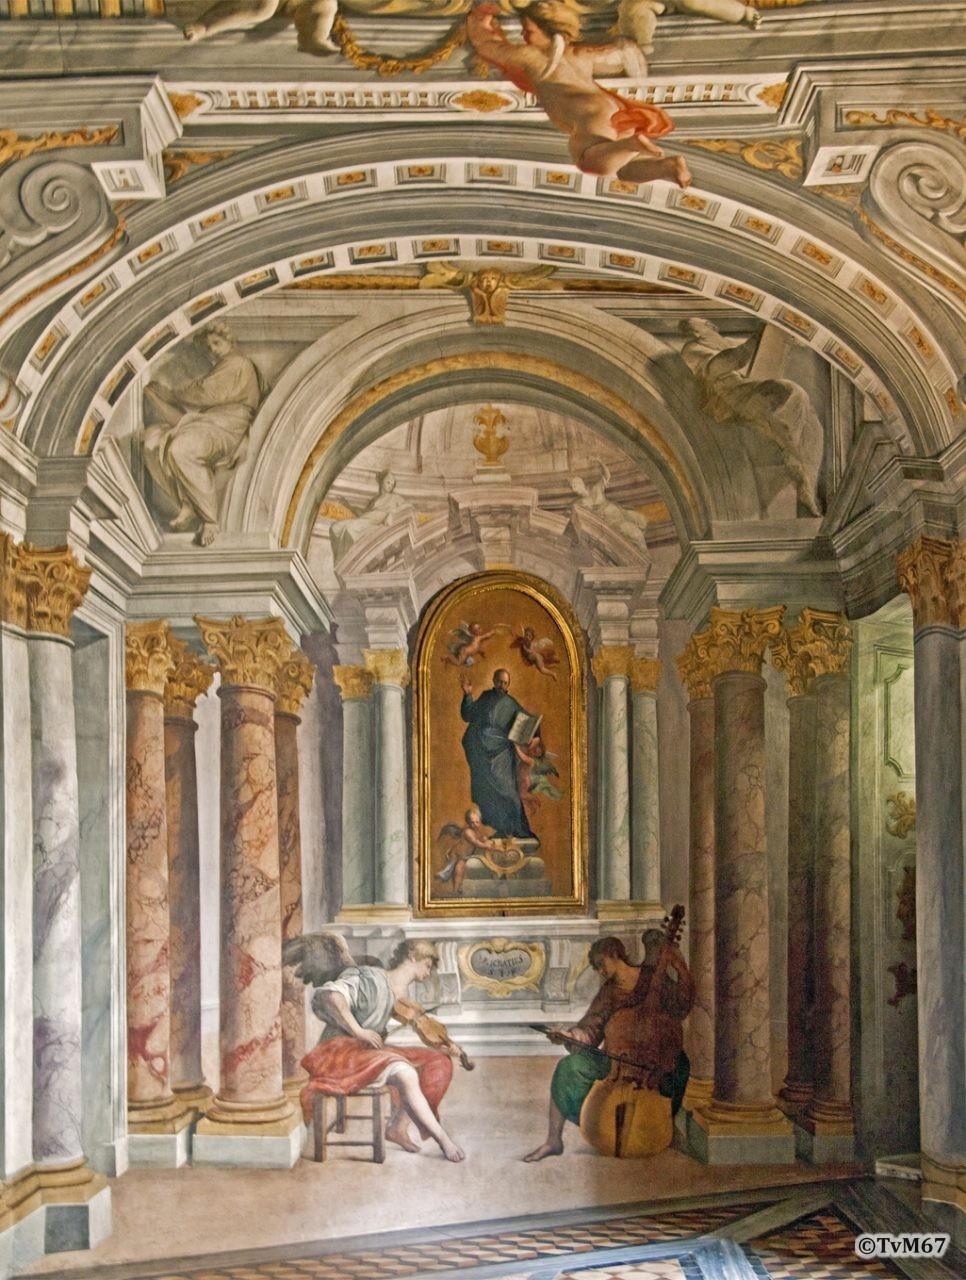 Roma, Casa Professa del Gesù, Pozzo, Corridoio, altaar,